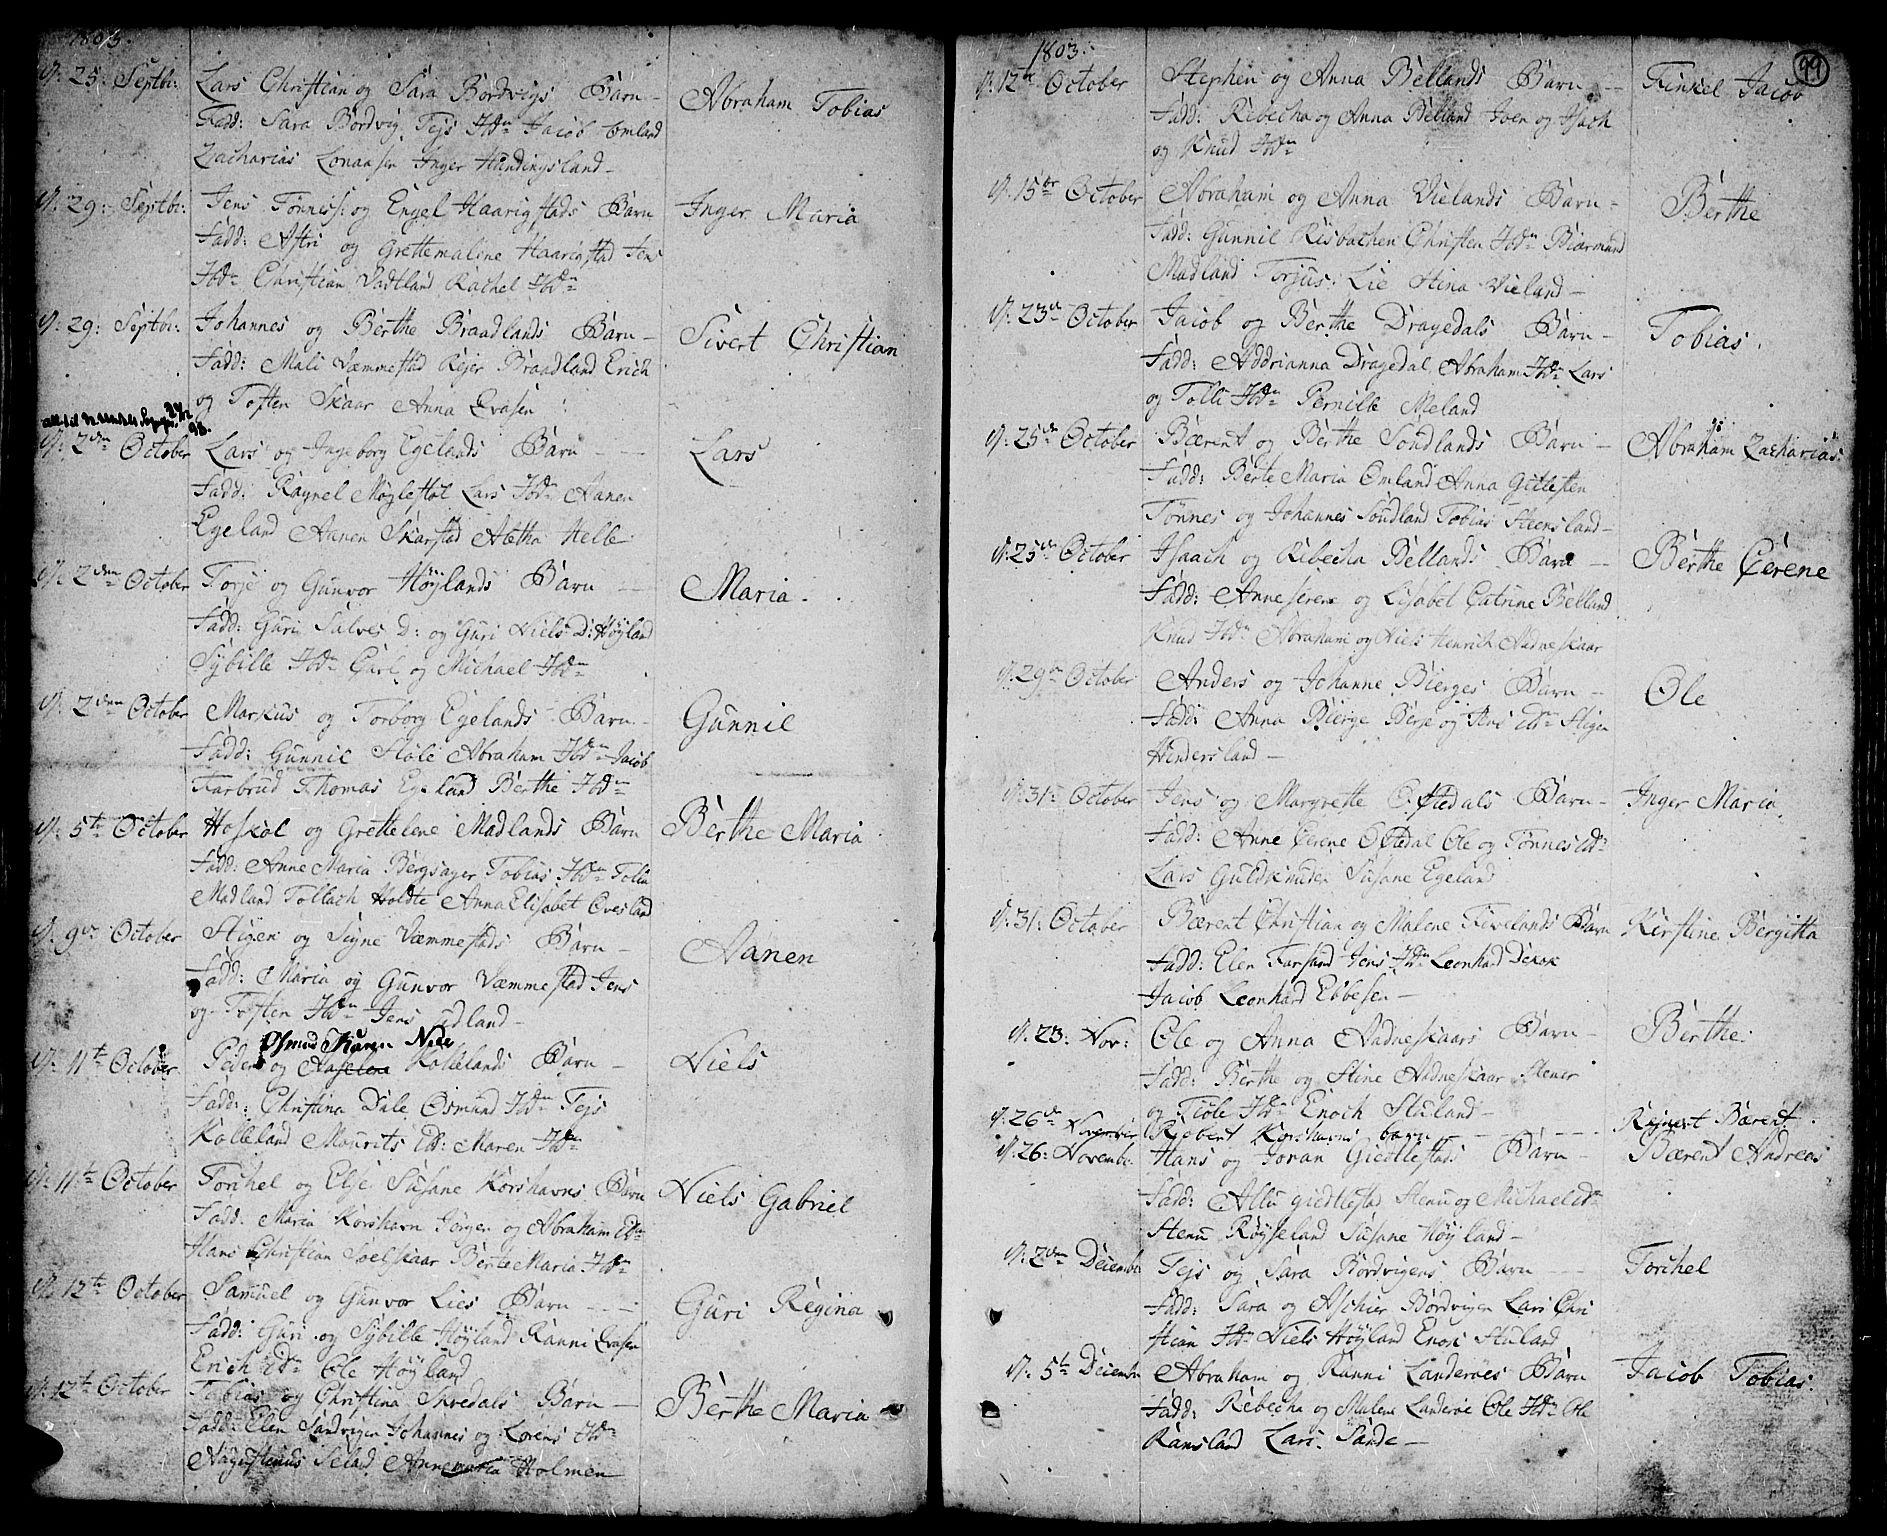 SAK, Lyngdal sokneprestkontor, F/Fa/Fac/L0004: Ministerialbok nr. A 4, 1780-1815, s. 99